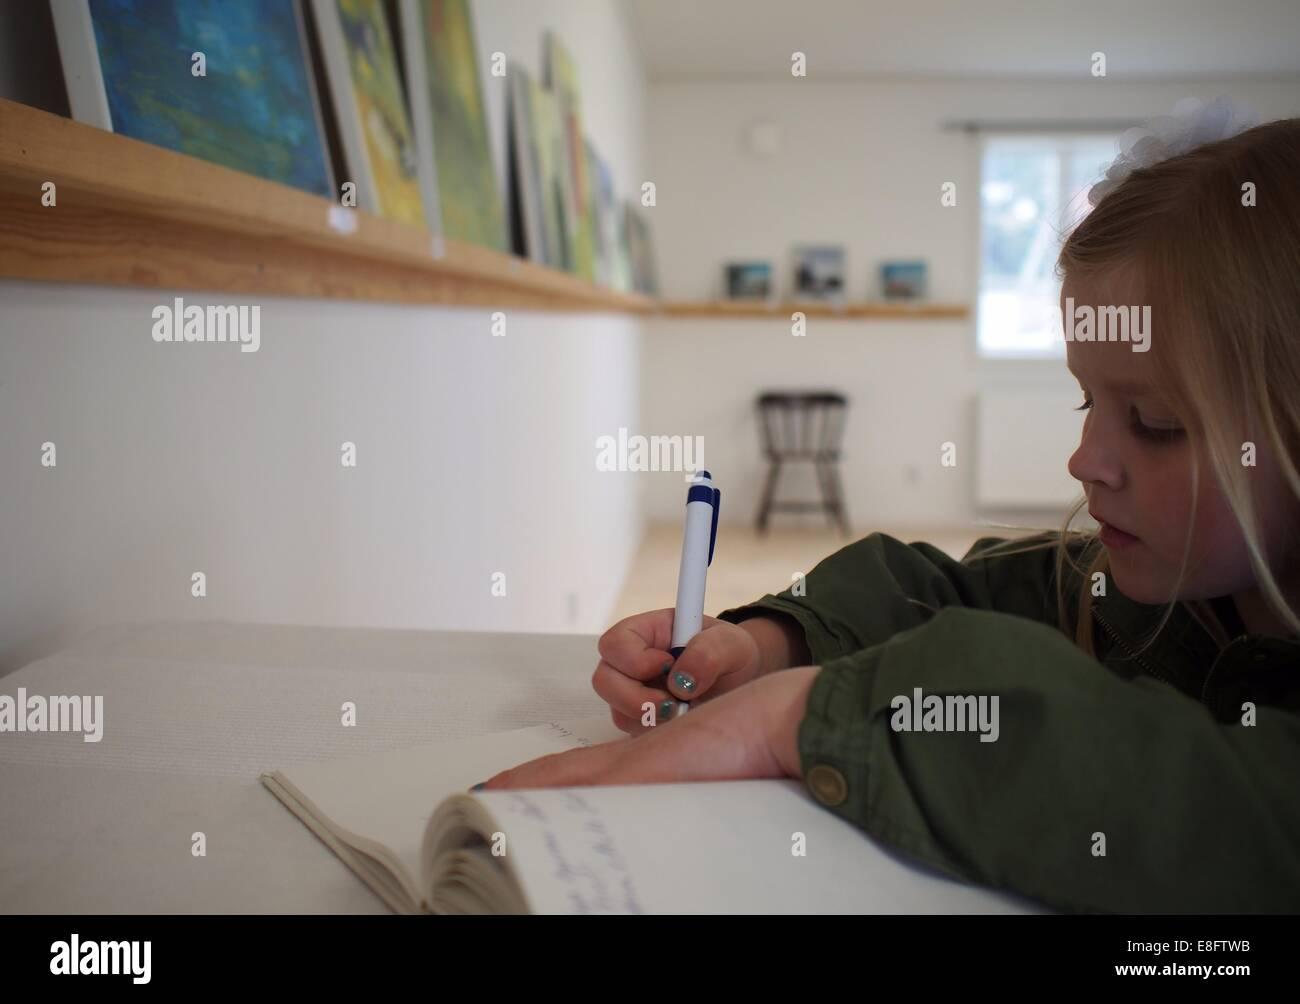 Suecia, Niña (8-9 años) escribe en un libro Imagen De Stock